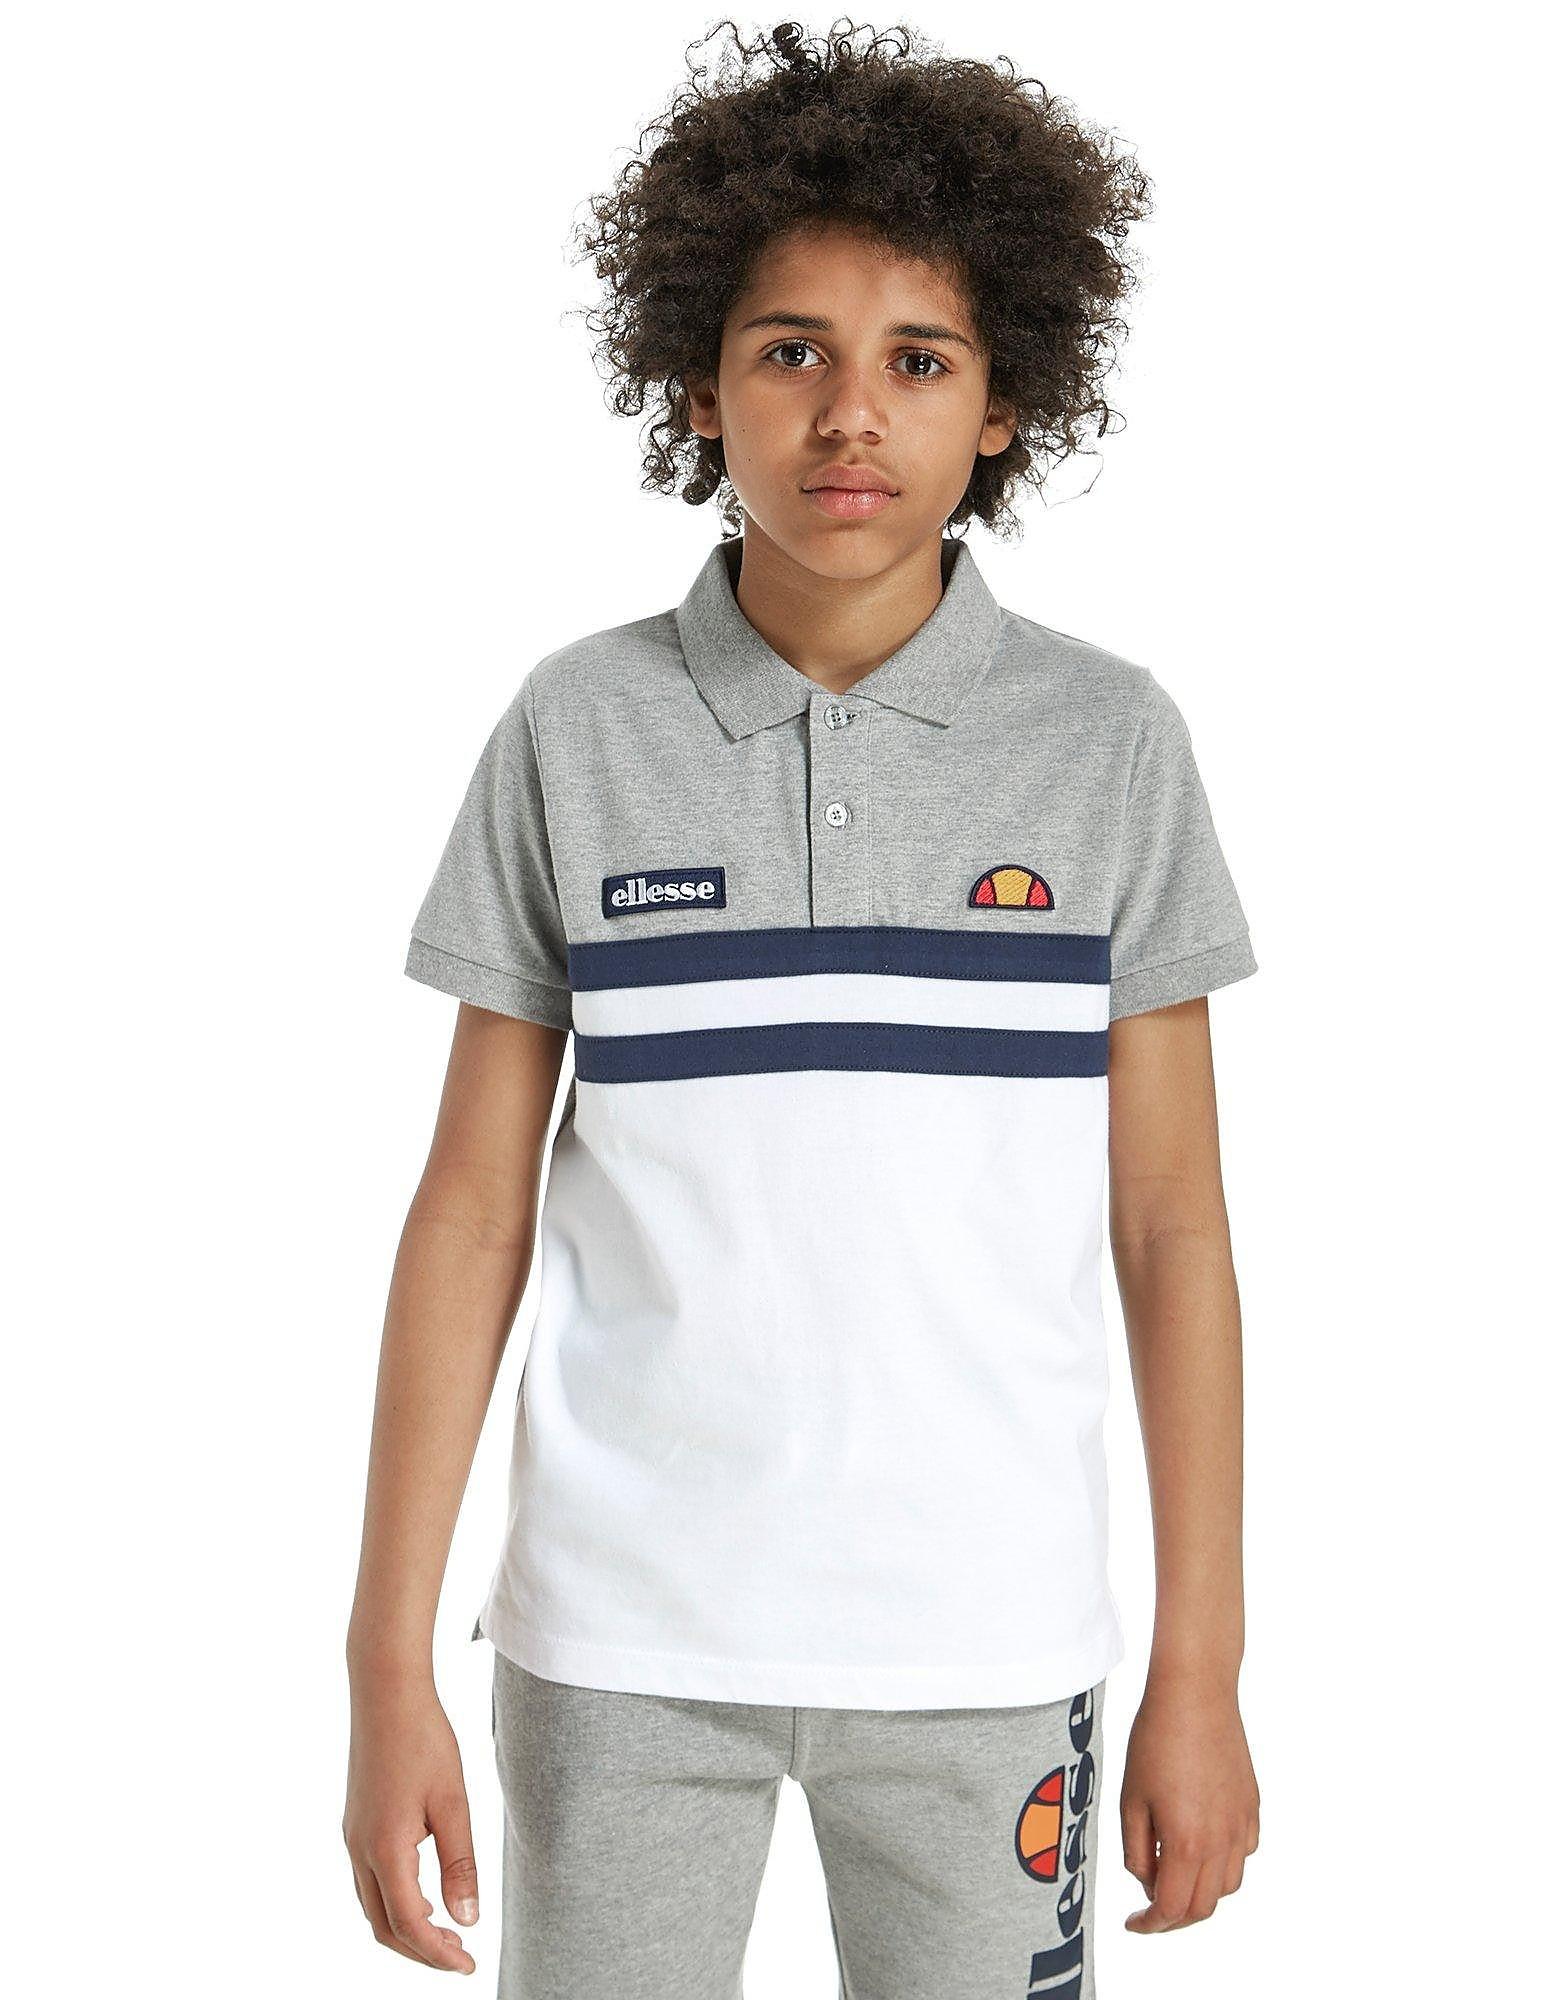 Ellesse Piovera Polo Shirt Junior